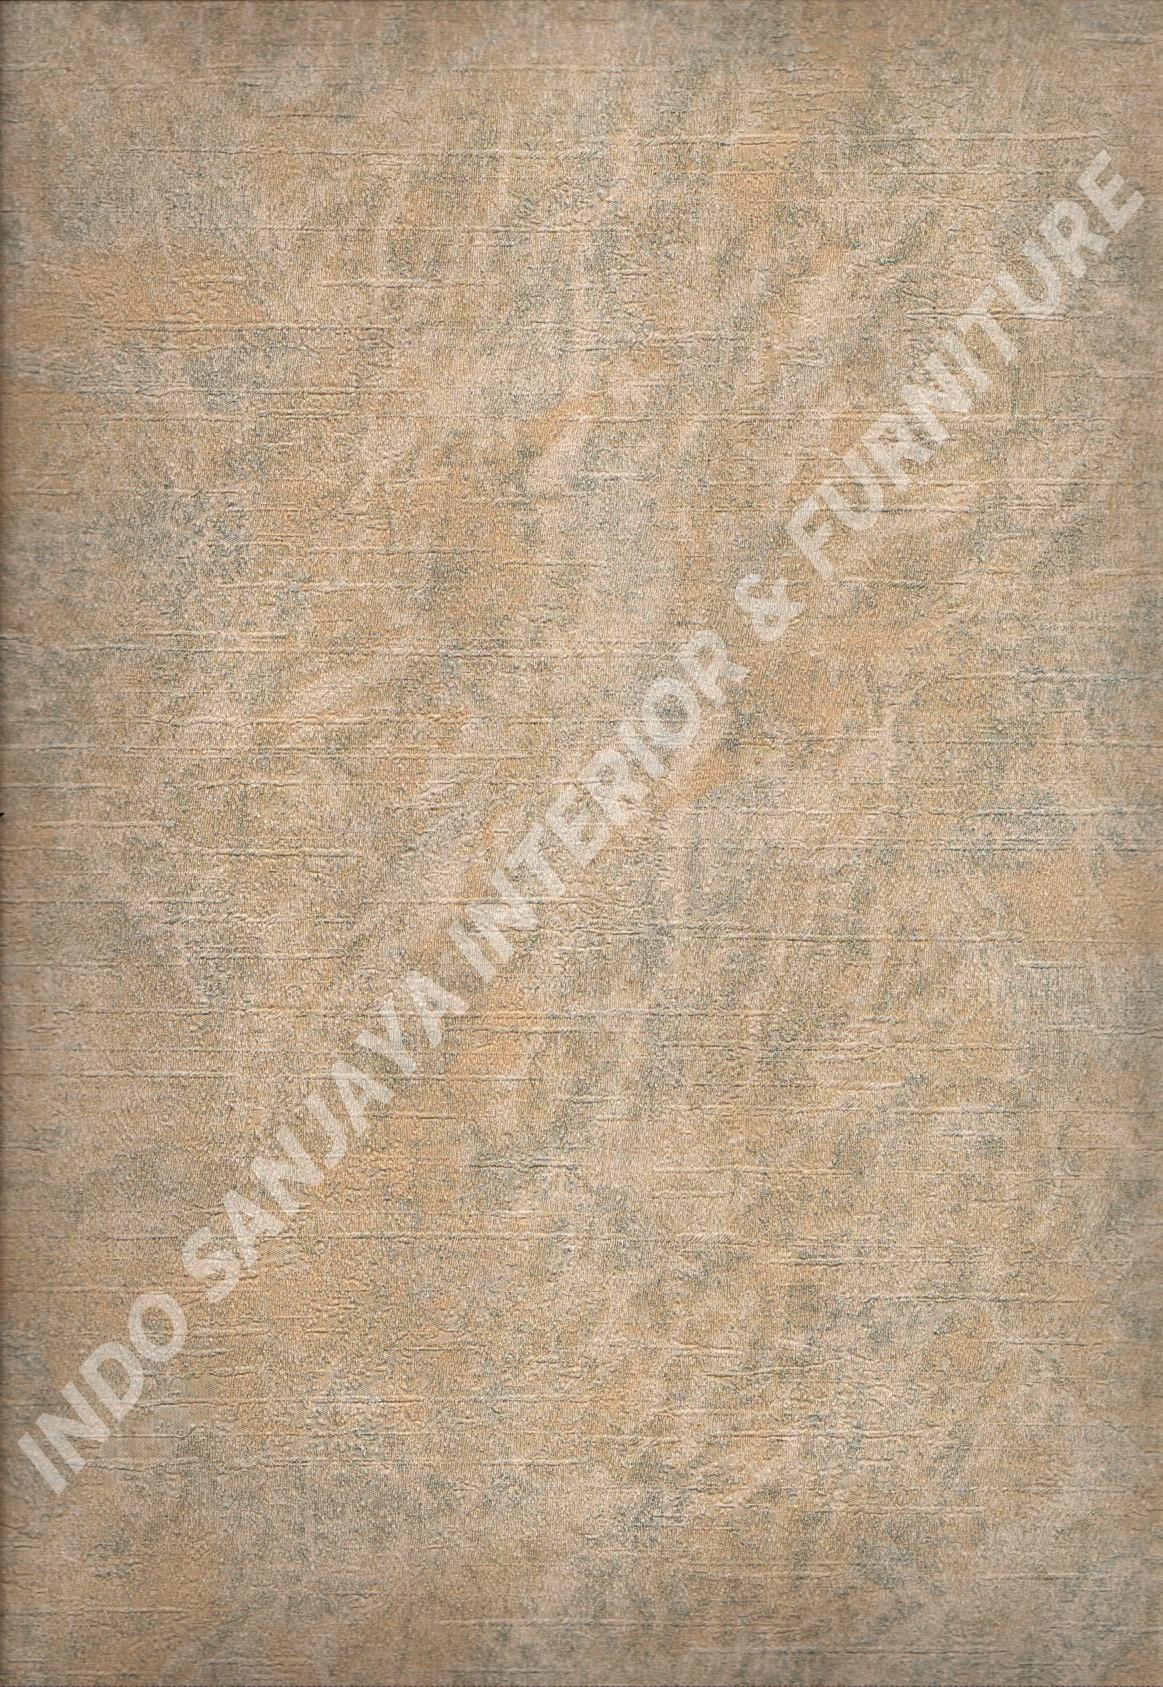 wallpaper   Wallpaper Minimalis Polos 8842:8842 corak  warna